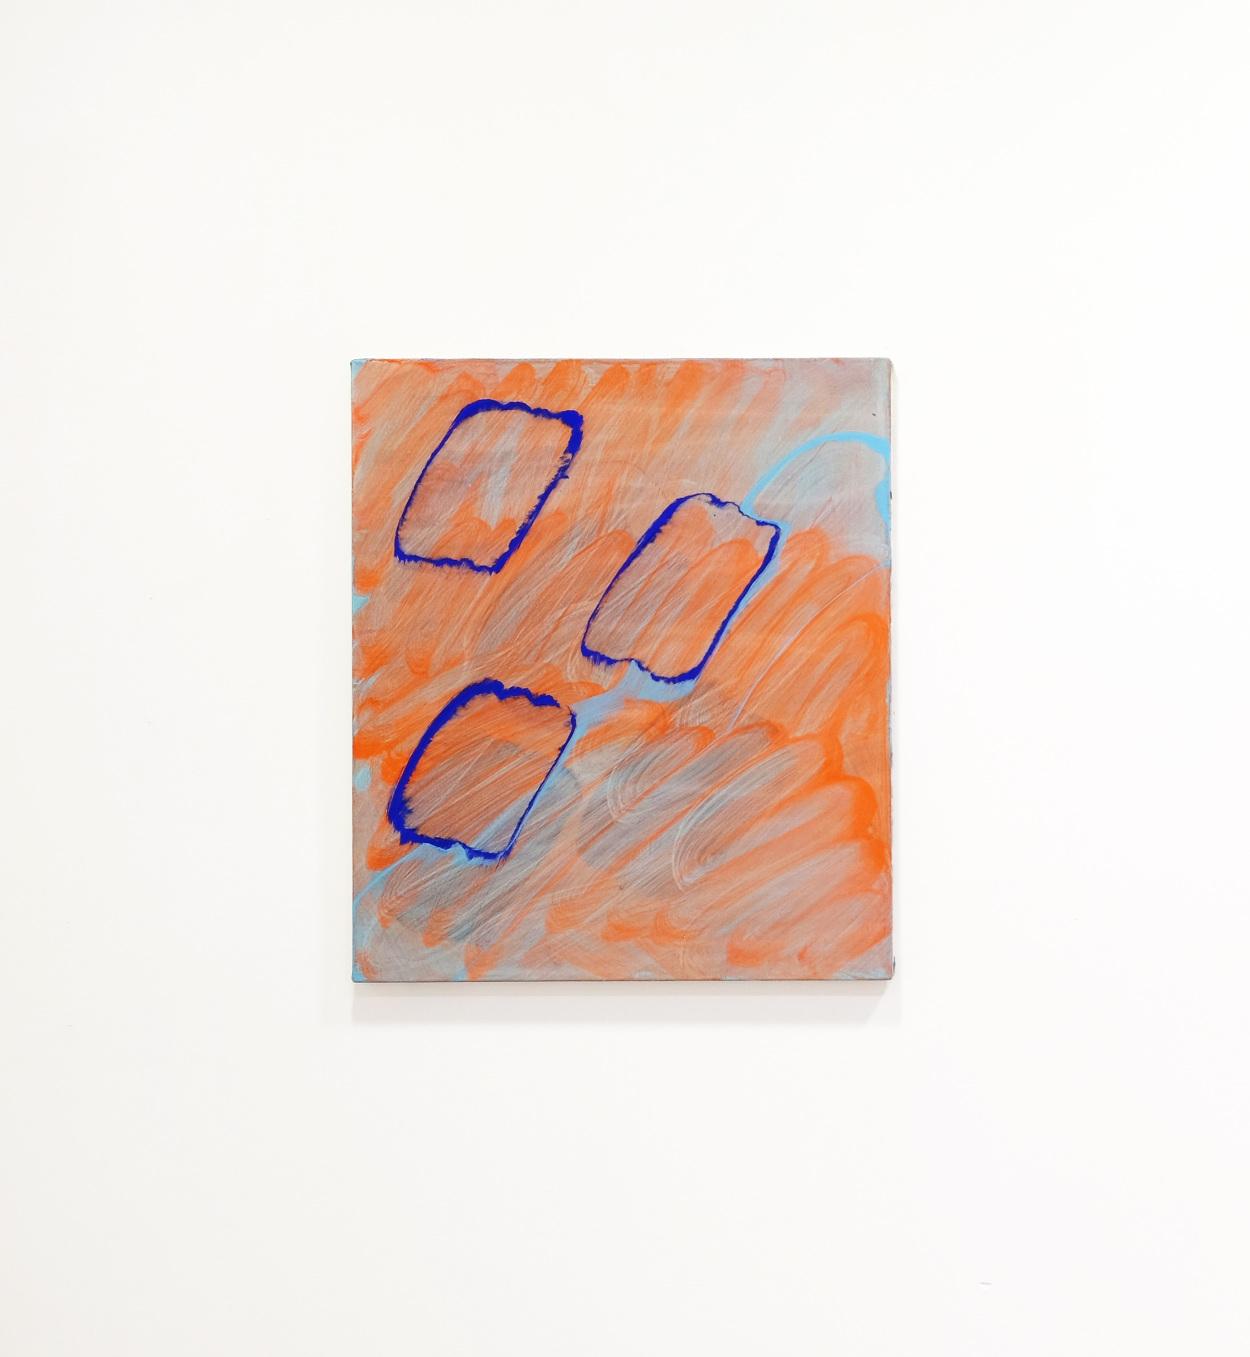 Goia Mujalli, Stream, Acrylic on canvas, 2016